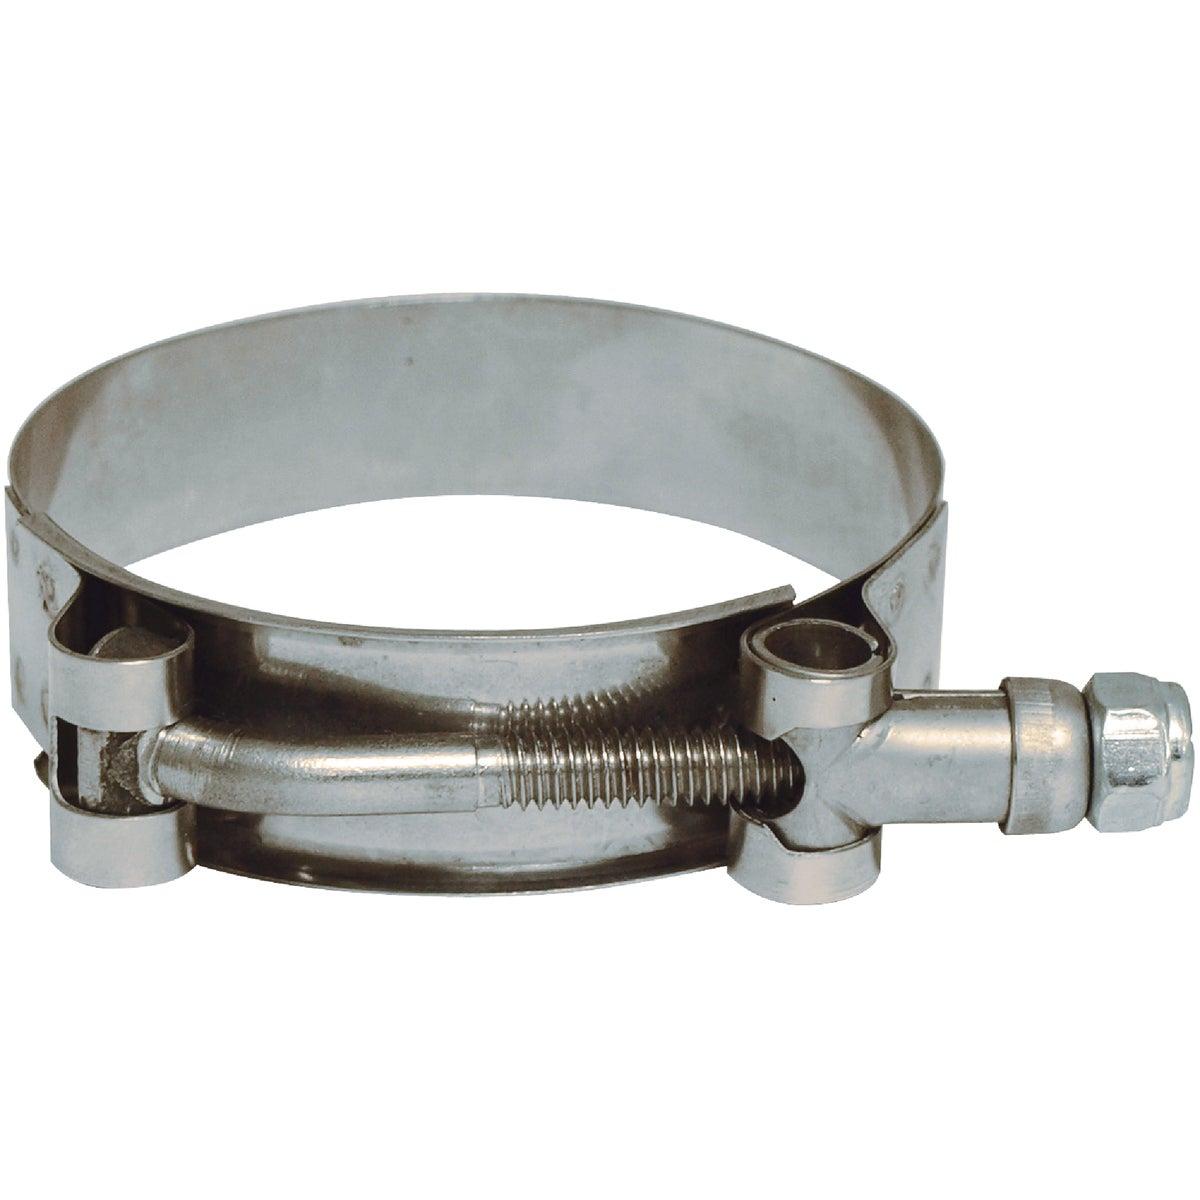 1-15/16-2-3/16TBLT CLAMP - 43082004 by Apache Hose Belting